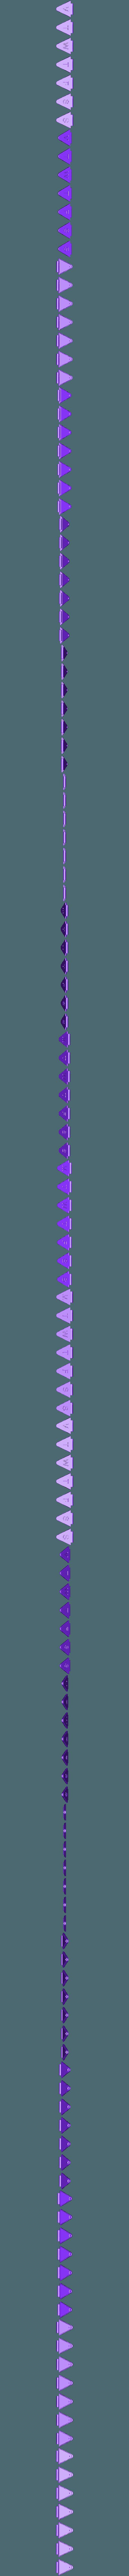 Lids.stl Download free STL file Pill Box weekly • Object to 3D print, Oggie